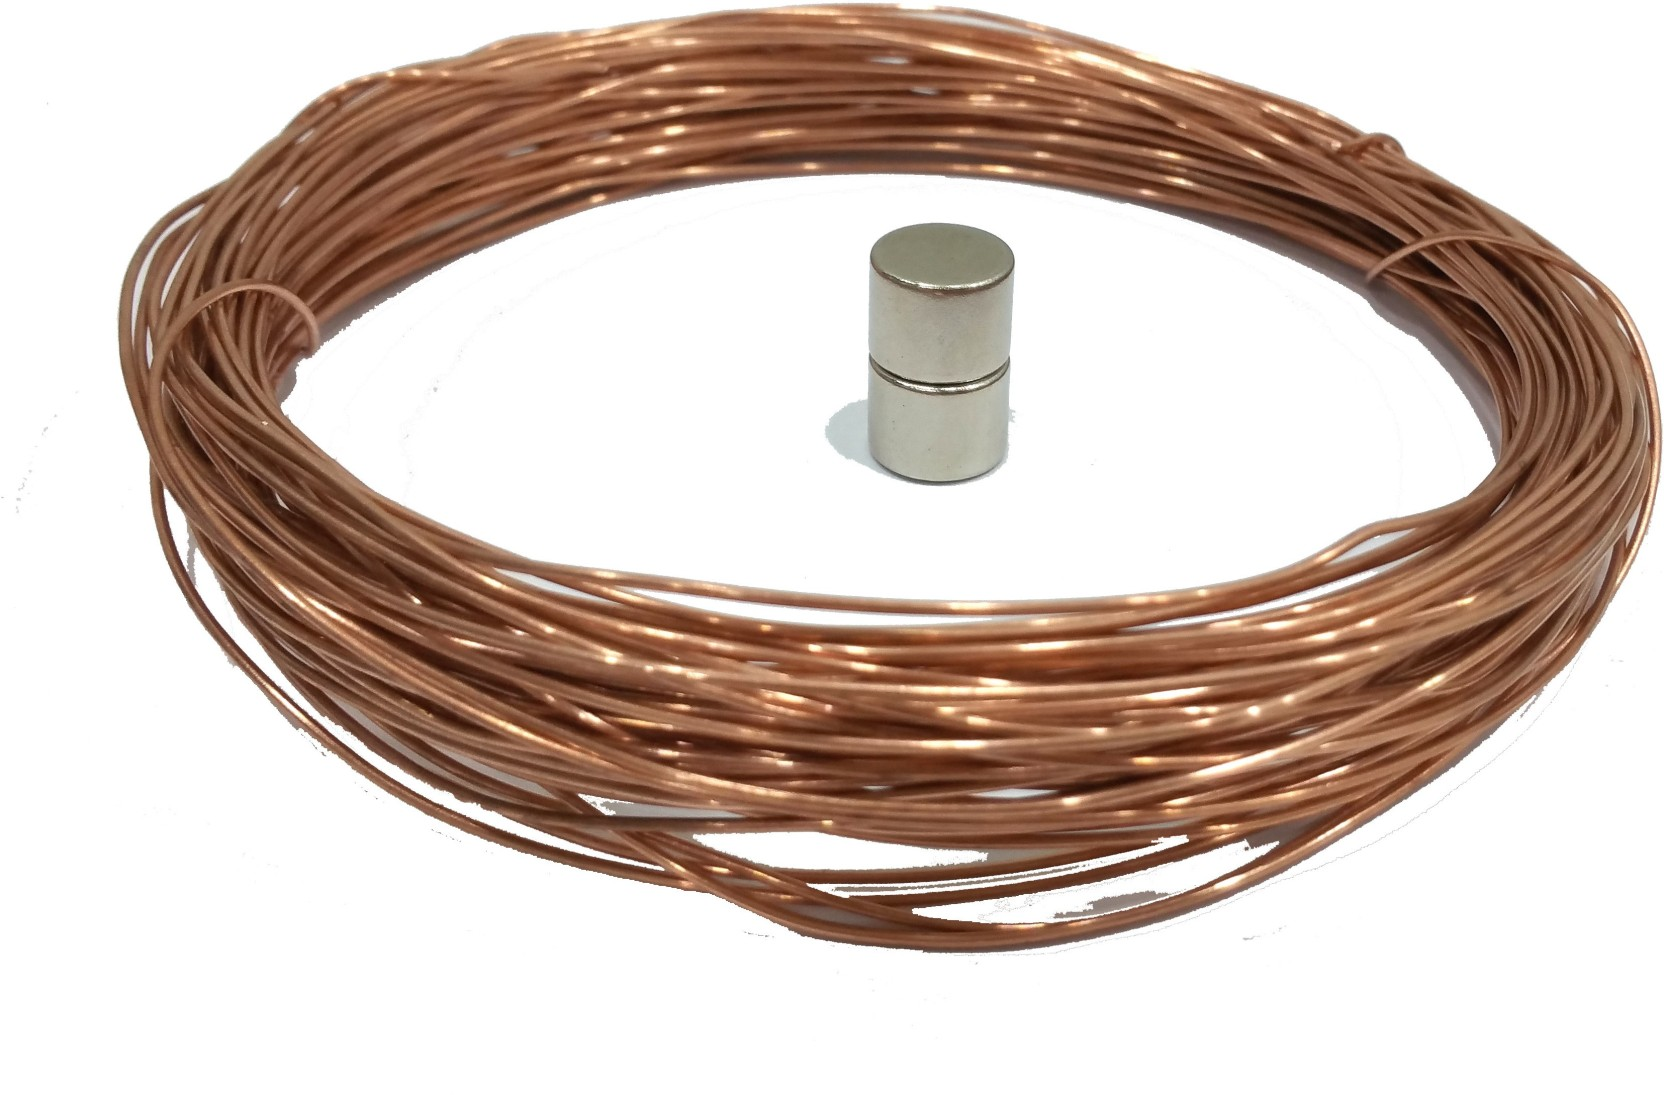 Techtone Magnetics Copper wire 20 meter with 2pcs 13mm diameter ...